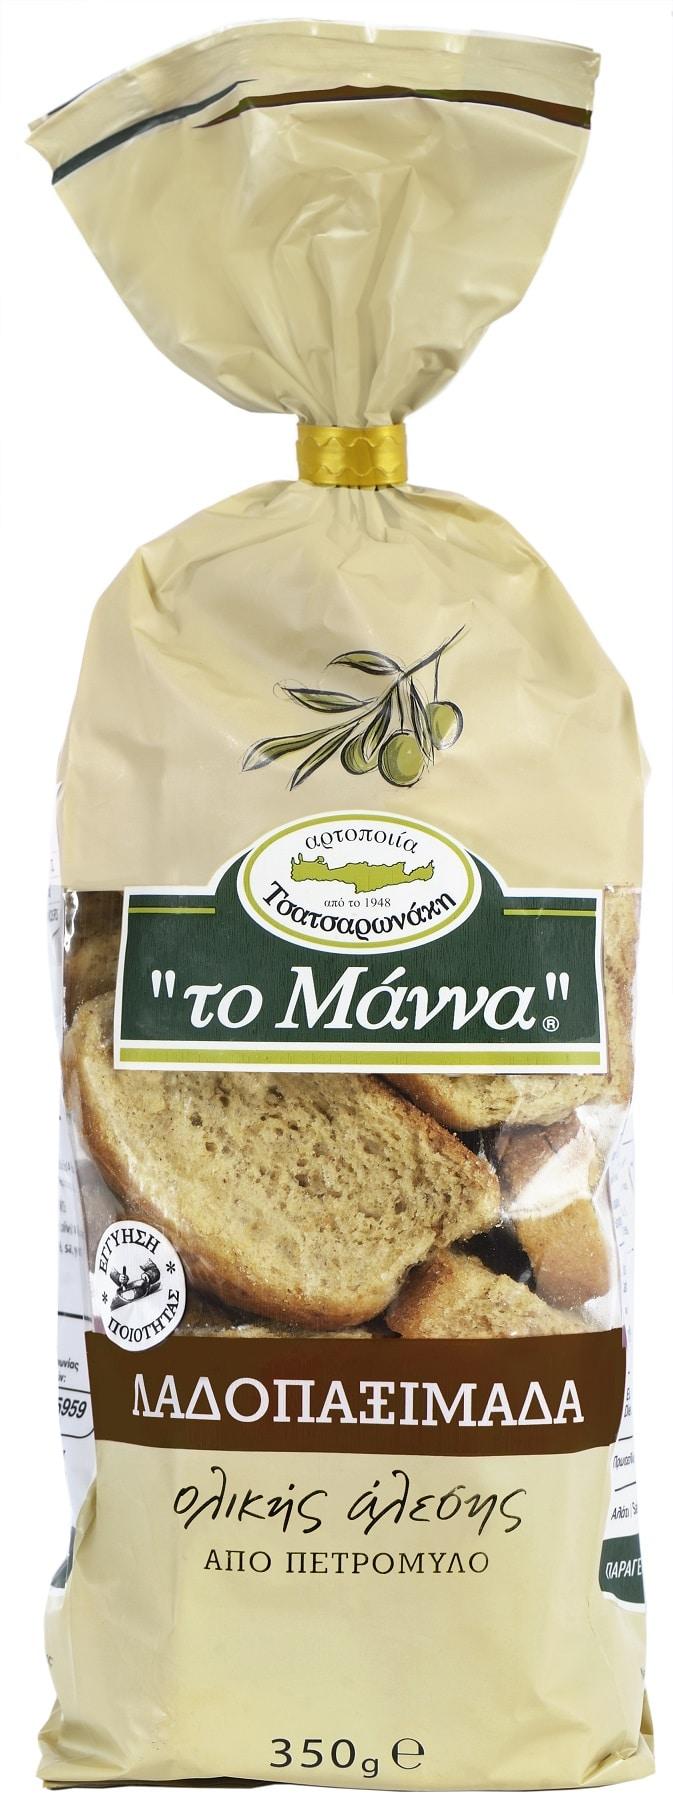 Manna Olive Oil Wholegrain Rusks from Stone Mill / Μάννα Λαδοπαξίμαδα Ολικής Άλεσης από Πετρόμυλο 350g